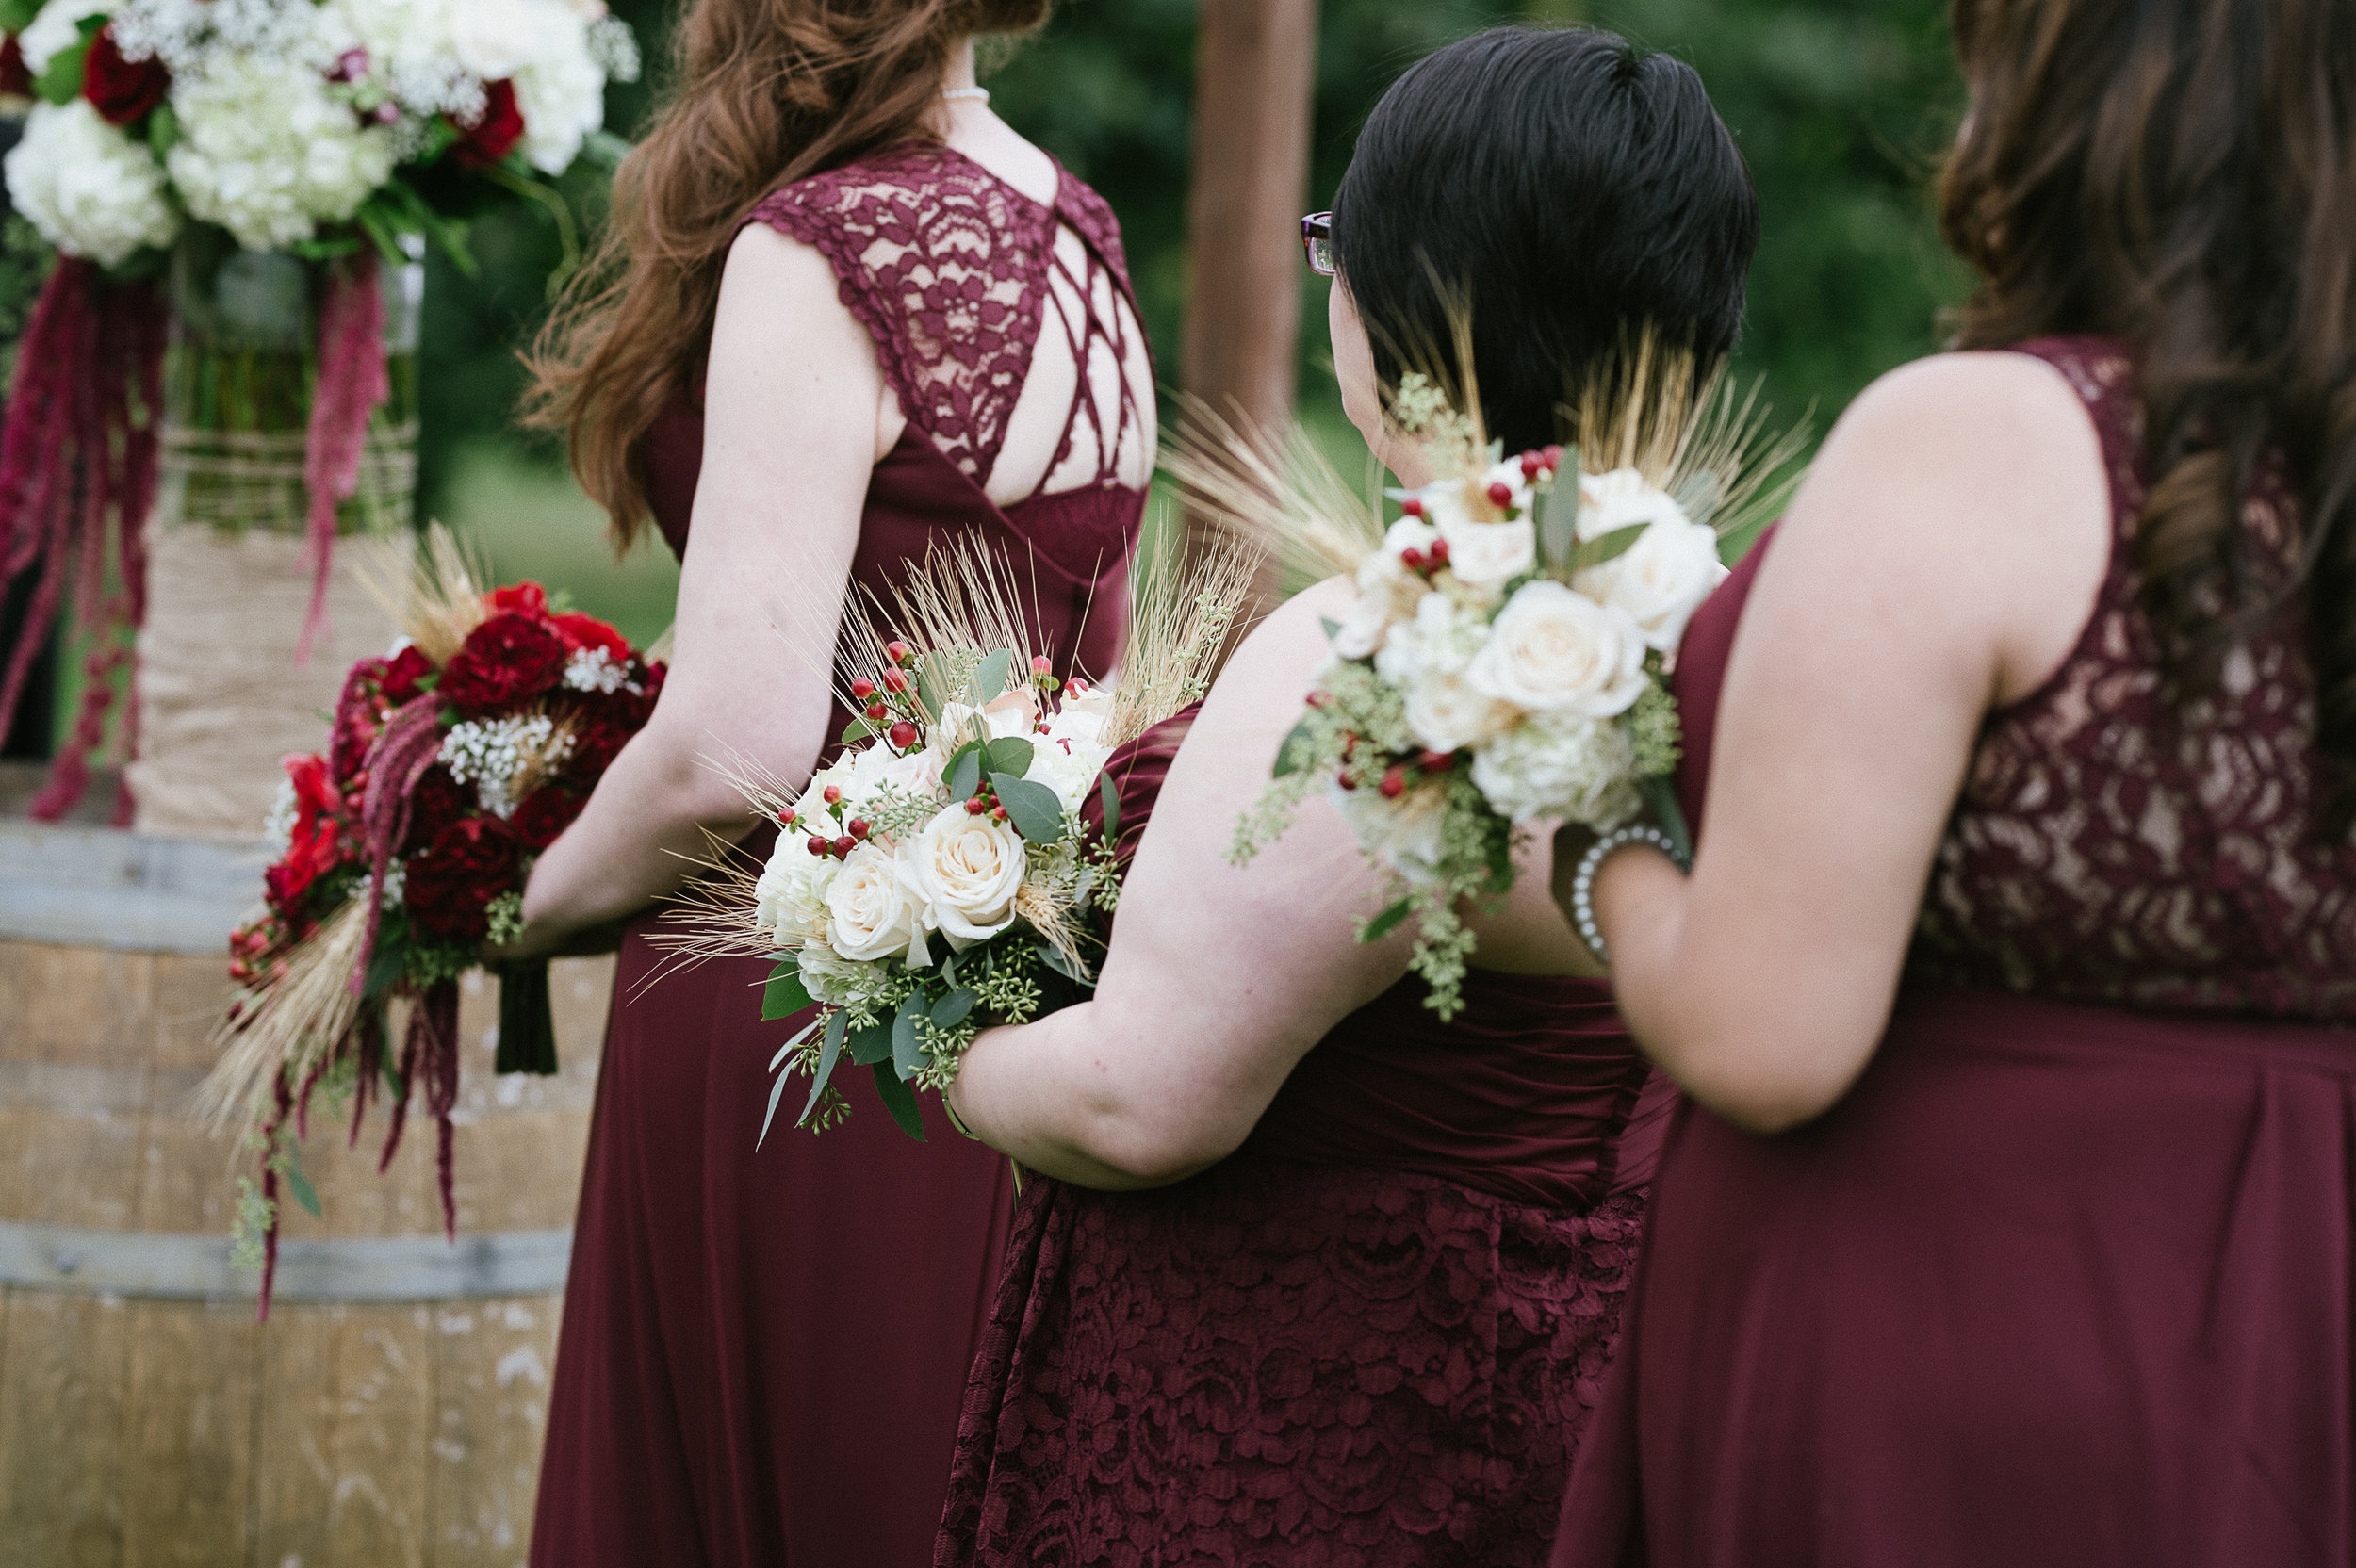 Swan Trail Farm Wedding_Sarah Schurman + Brian Skadan_Snohomish Wedding_Kelsey Lane Photography-6079.jpg